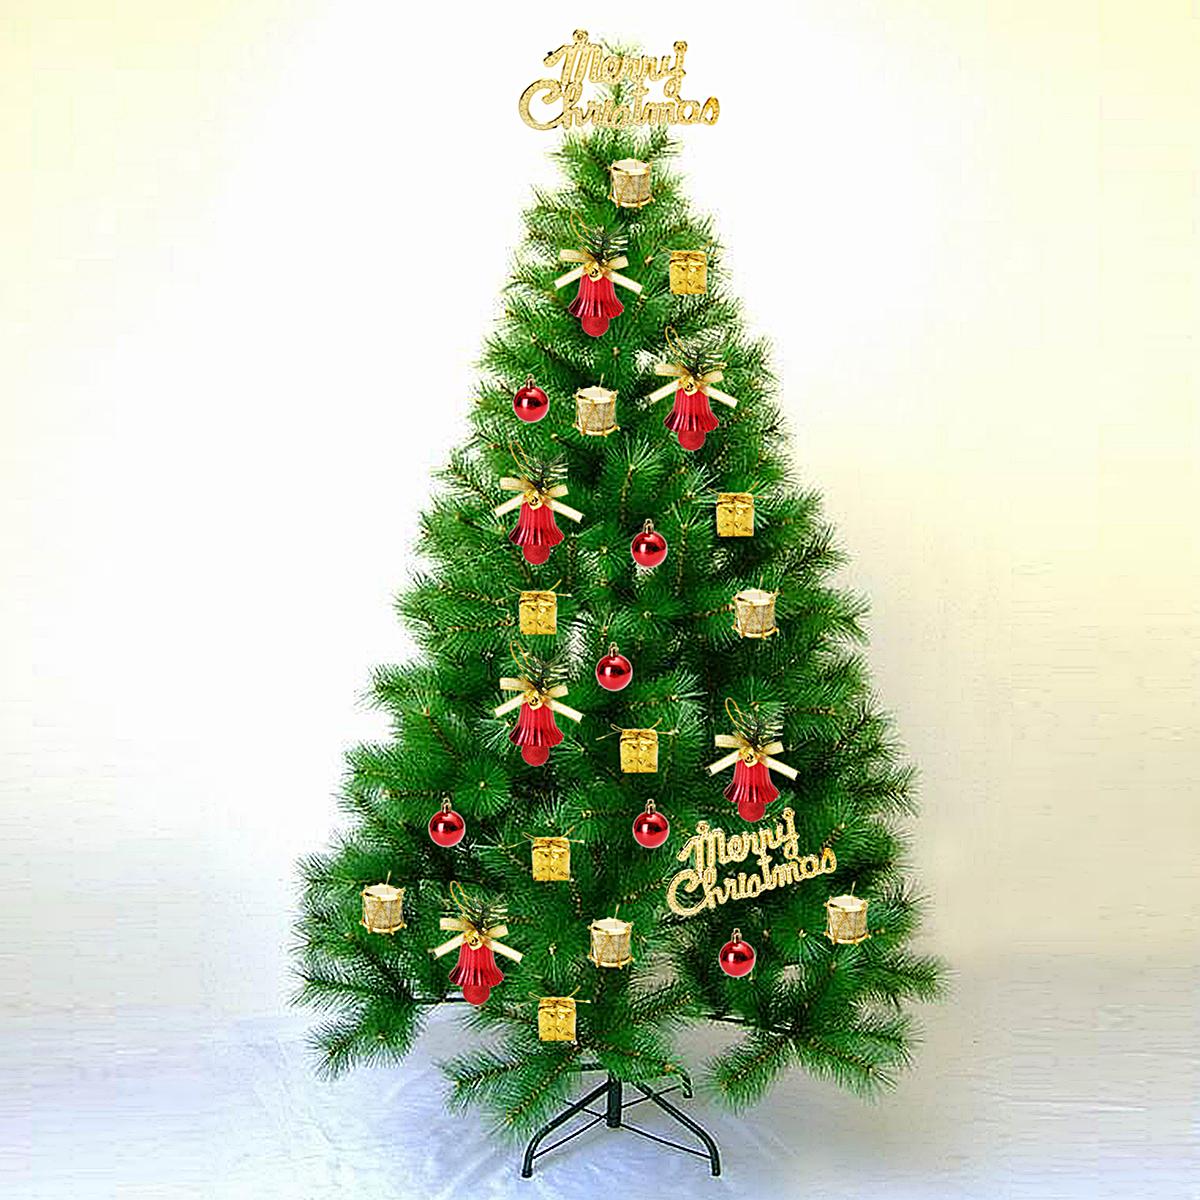 Christmas Tree Balls Decorations.32pcs Christmas Ornaments Balls Drums Baubles Xmas Tree Pendant Home Party Decor